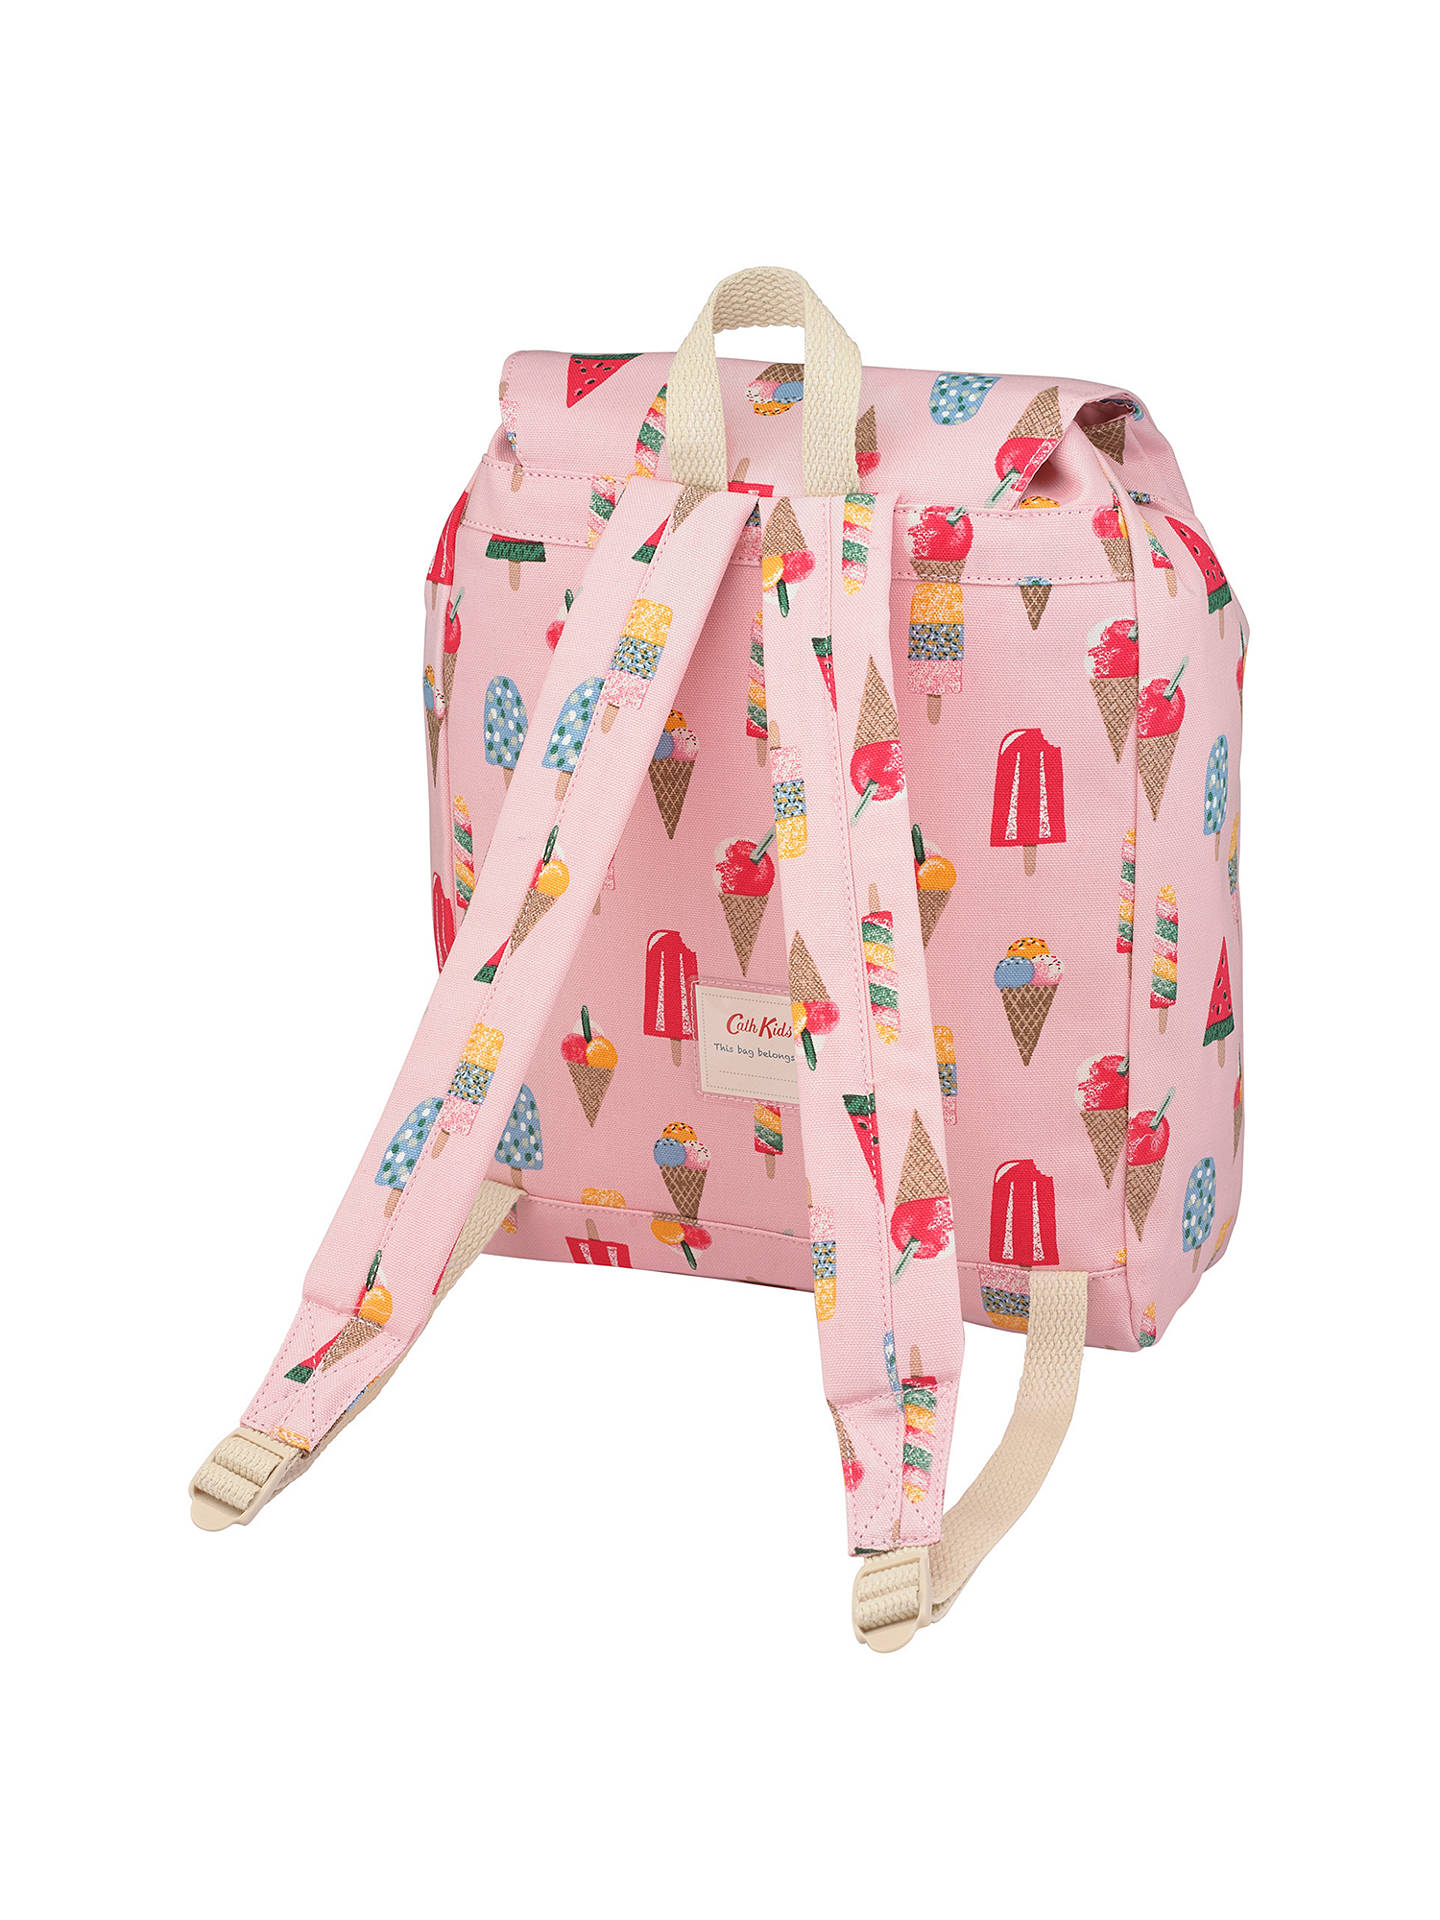 ... BuyCath Kidston Children s Little Ice Cream Summer Backpack a74abf0b5aee8